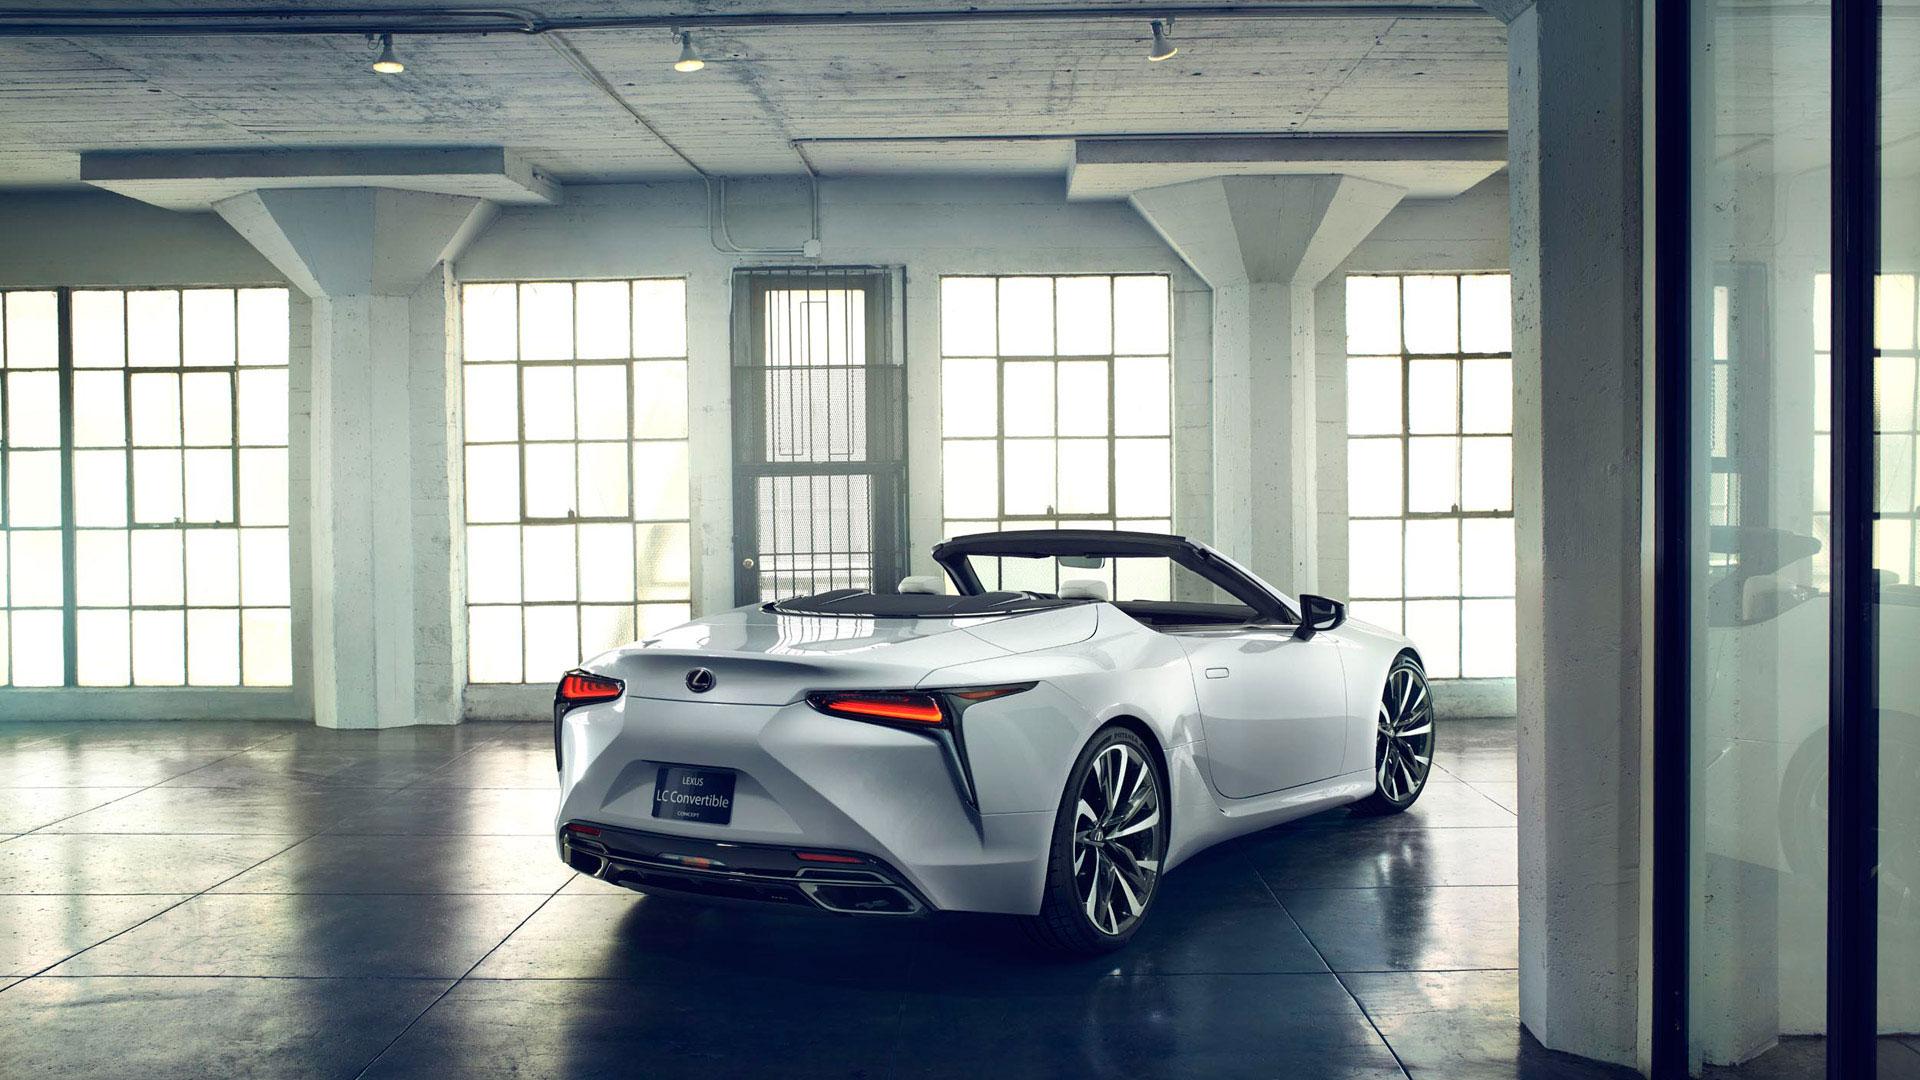 Lexus LC convertible Concept gallery03 1920x1080 v2